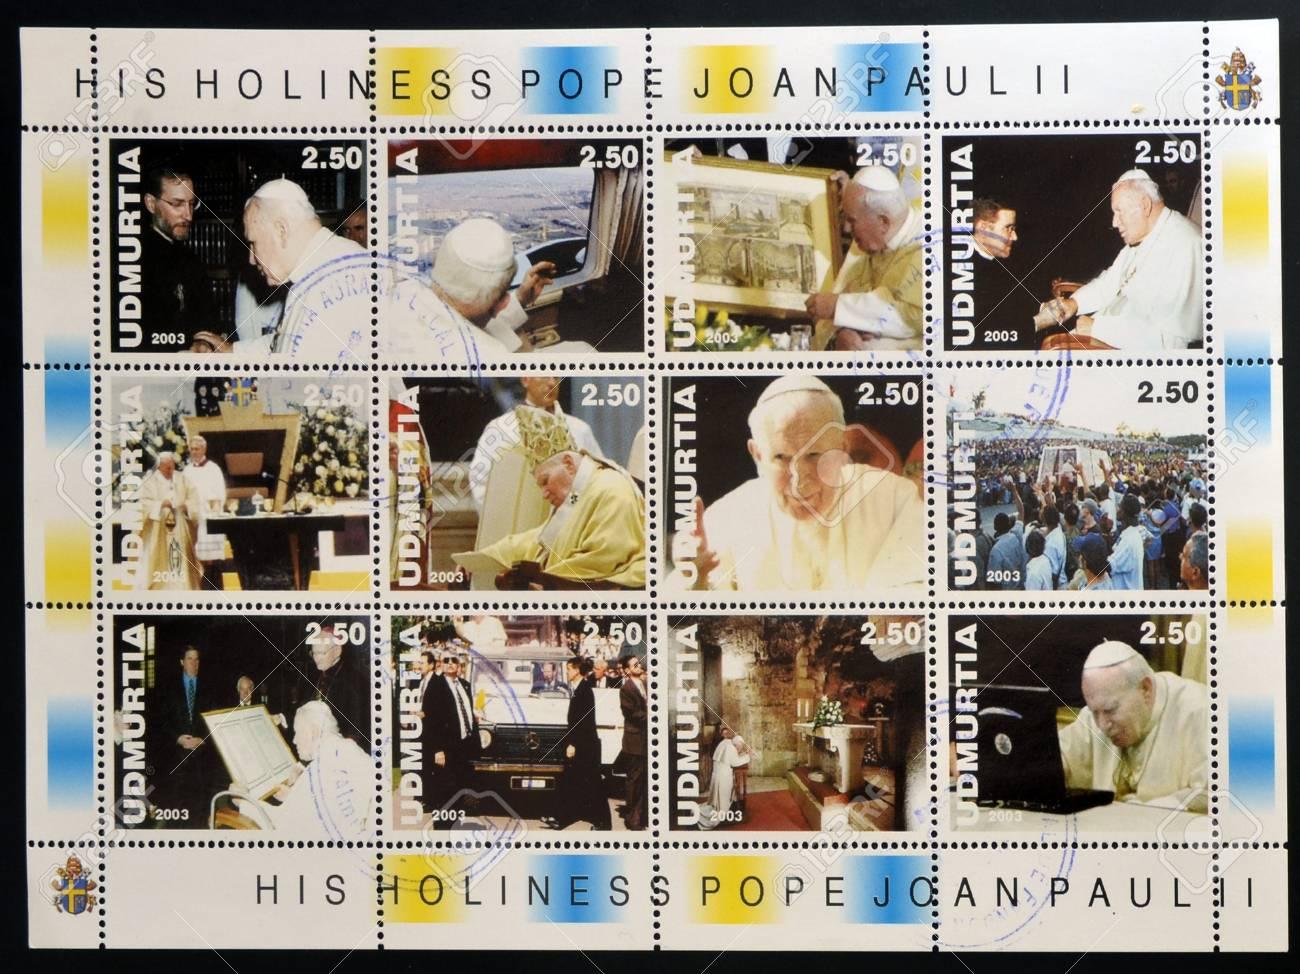 UDMURTIA - CIRCA 2003: Collection stamps printed in Udmurtia shows Pope John Paul II, circa 2003 Stock Photo - 14521098